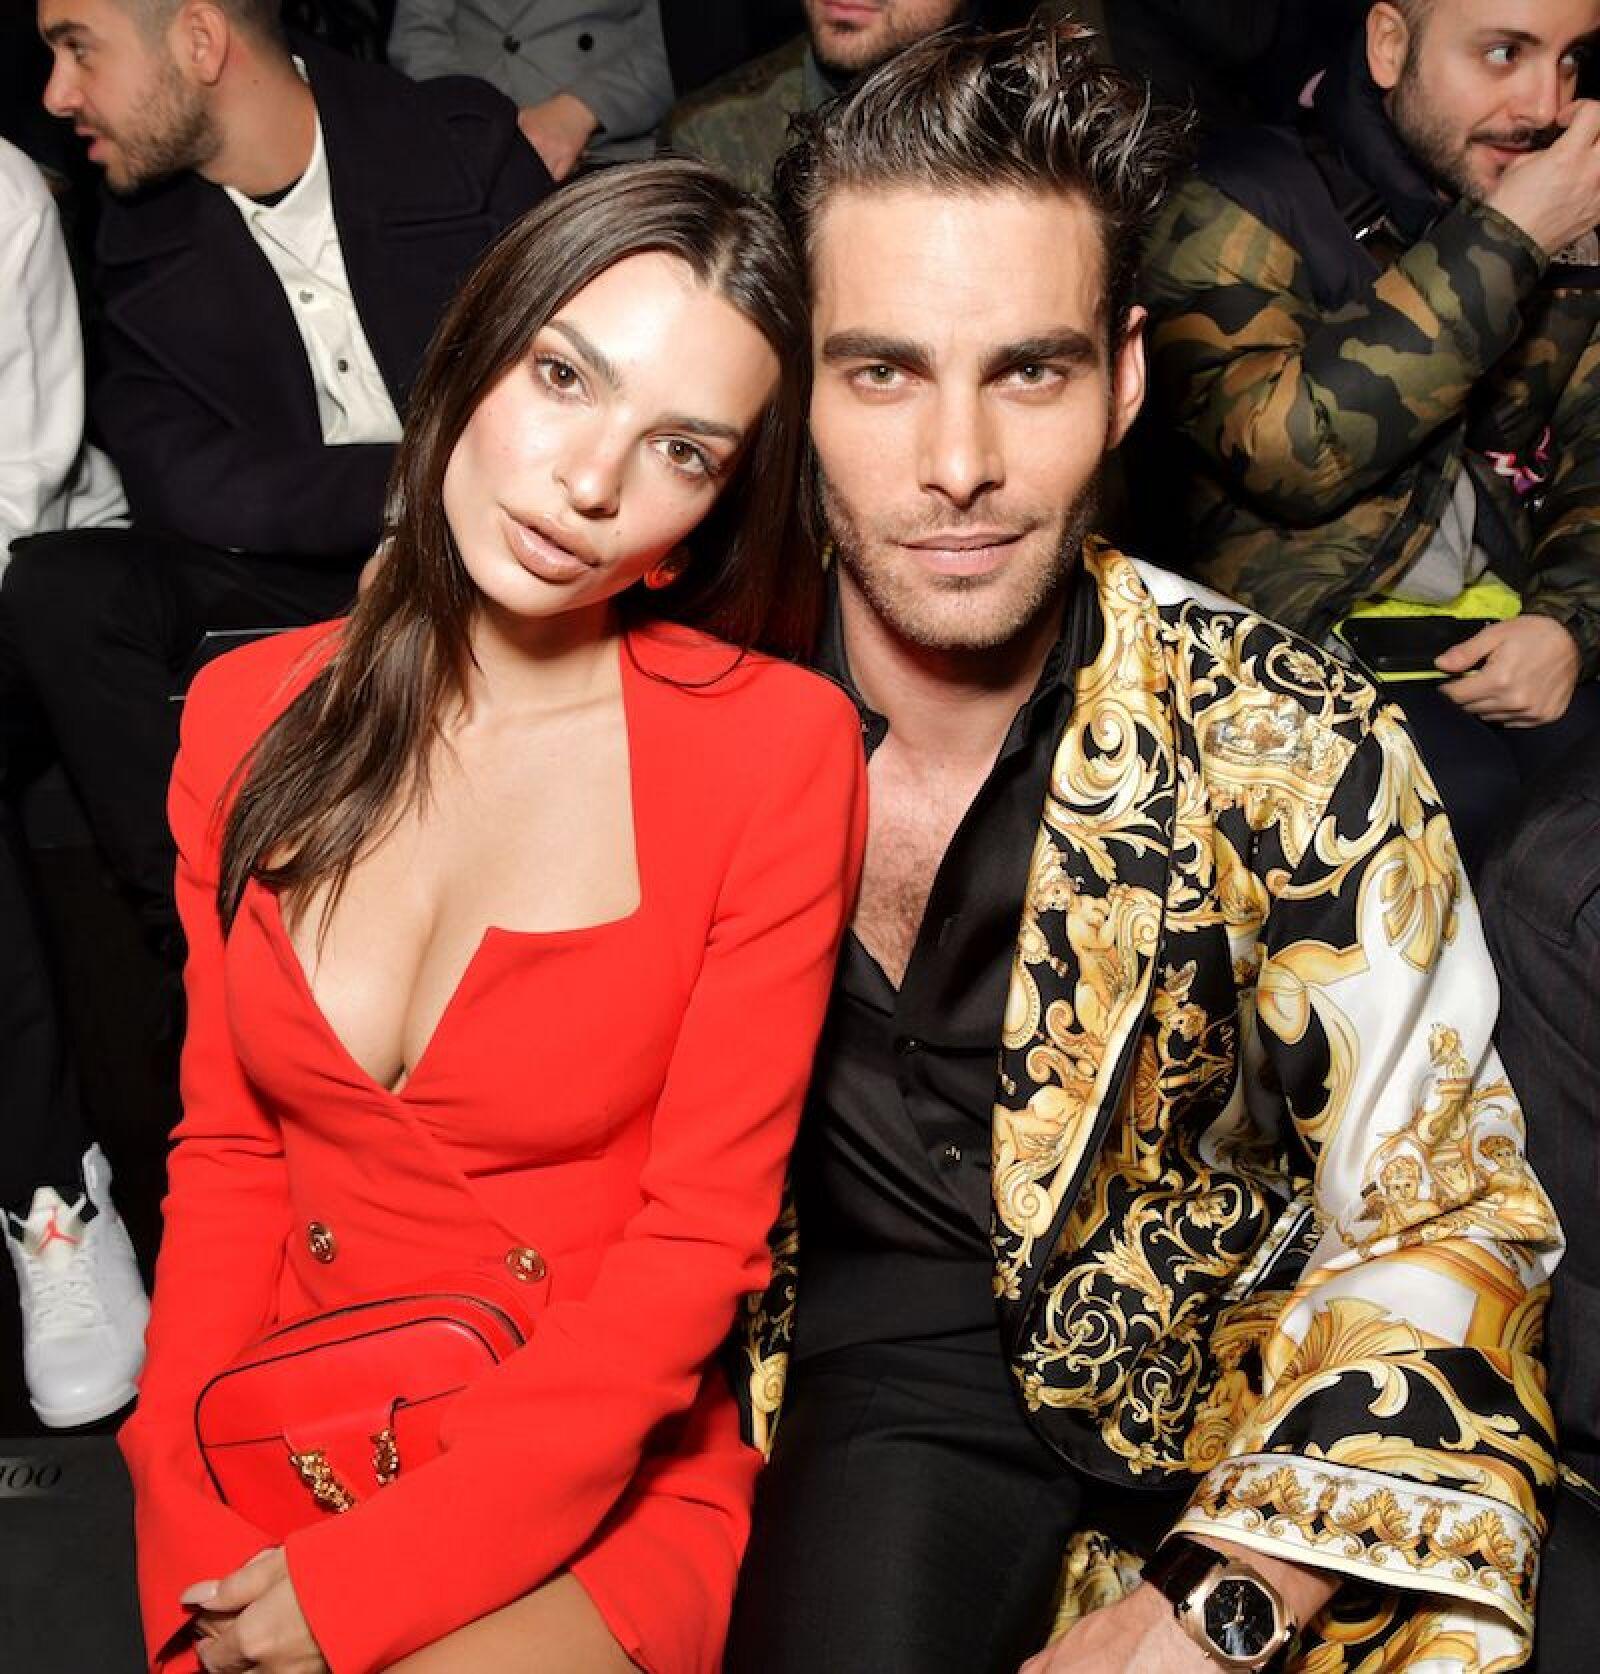 Versace show, Front Row, Fall Winter 2020, Milan Fashion Week, Italy - 21 Feb 2020